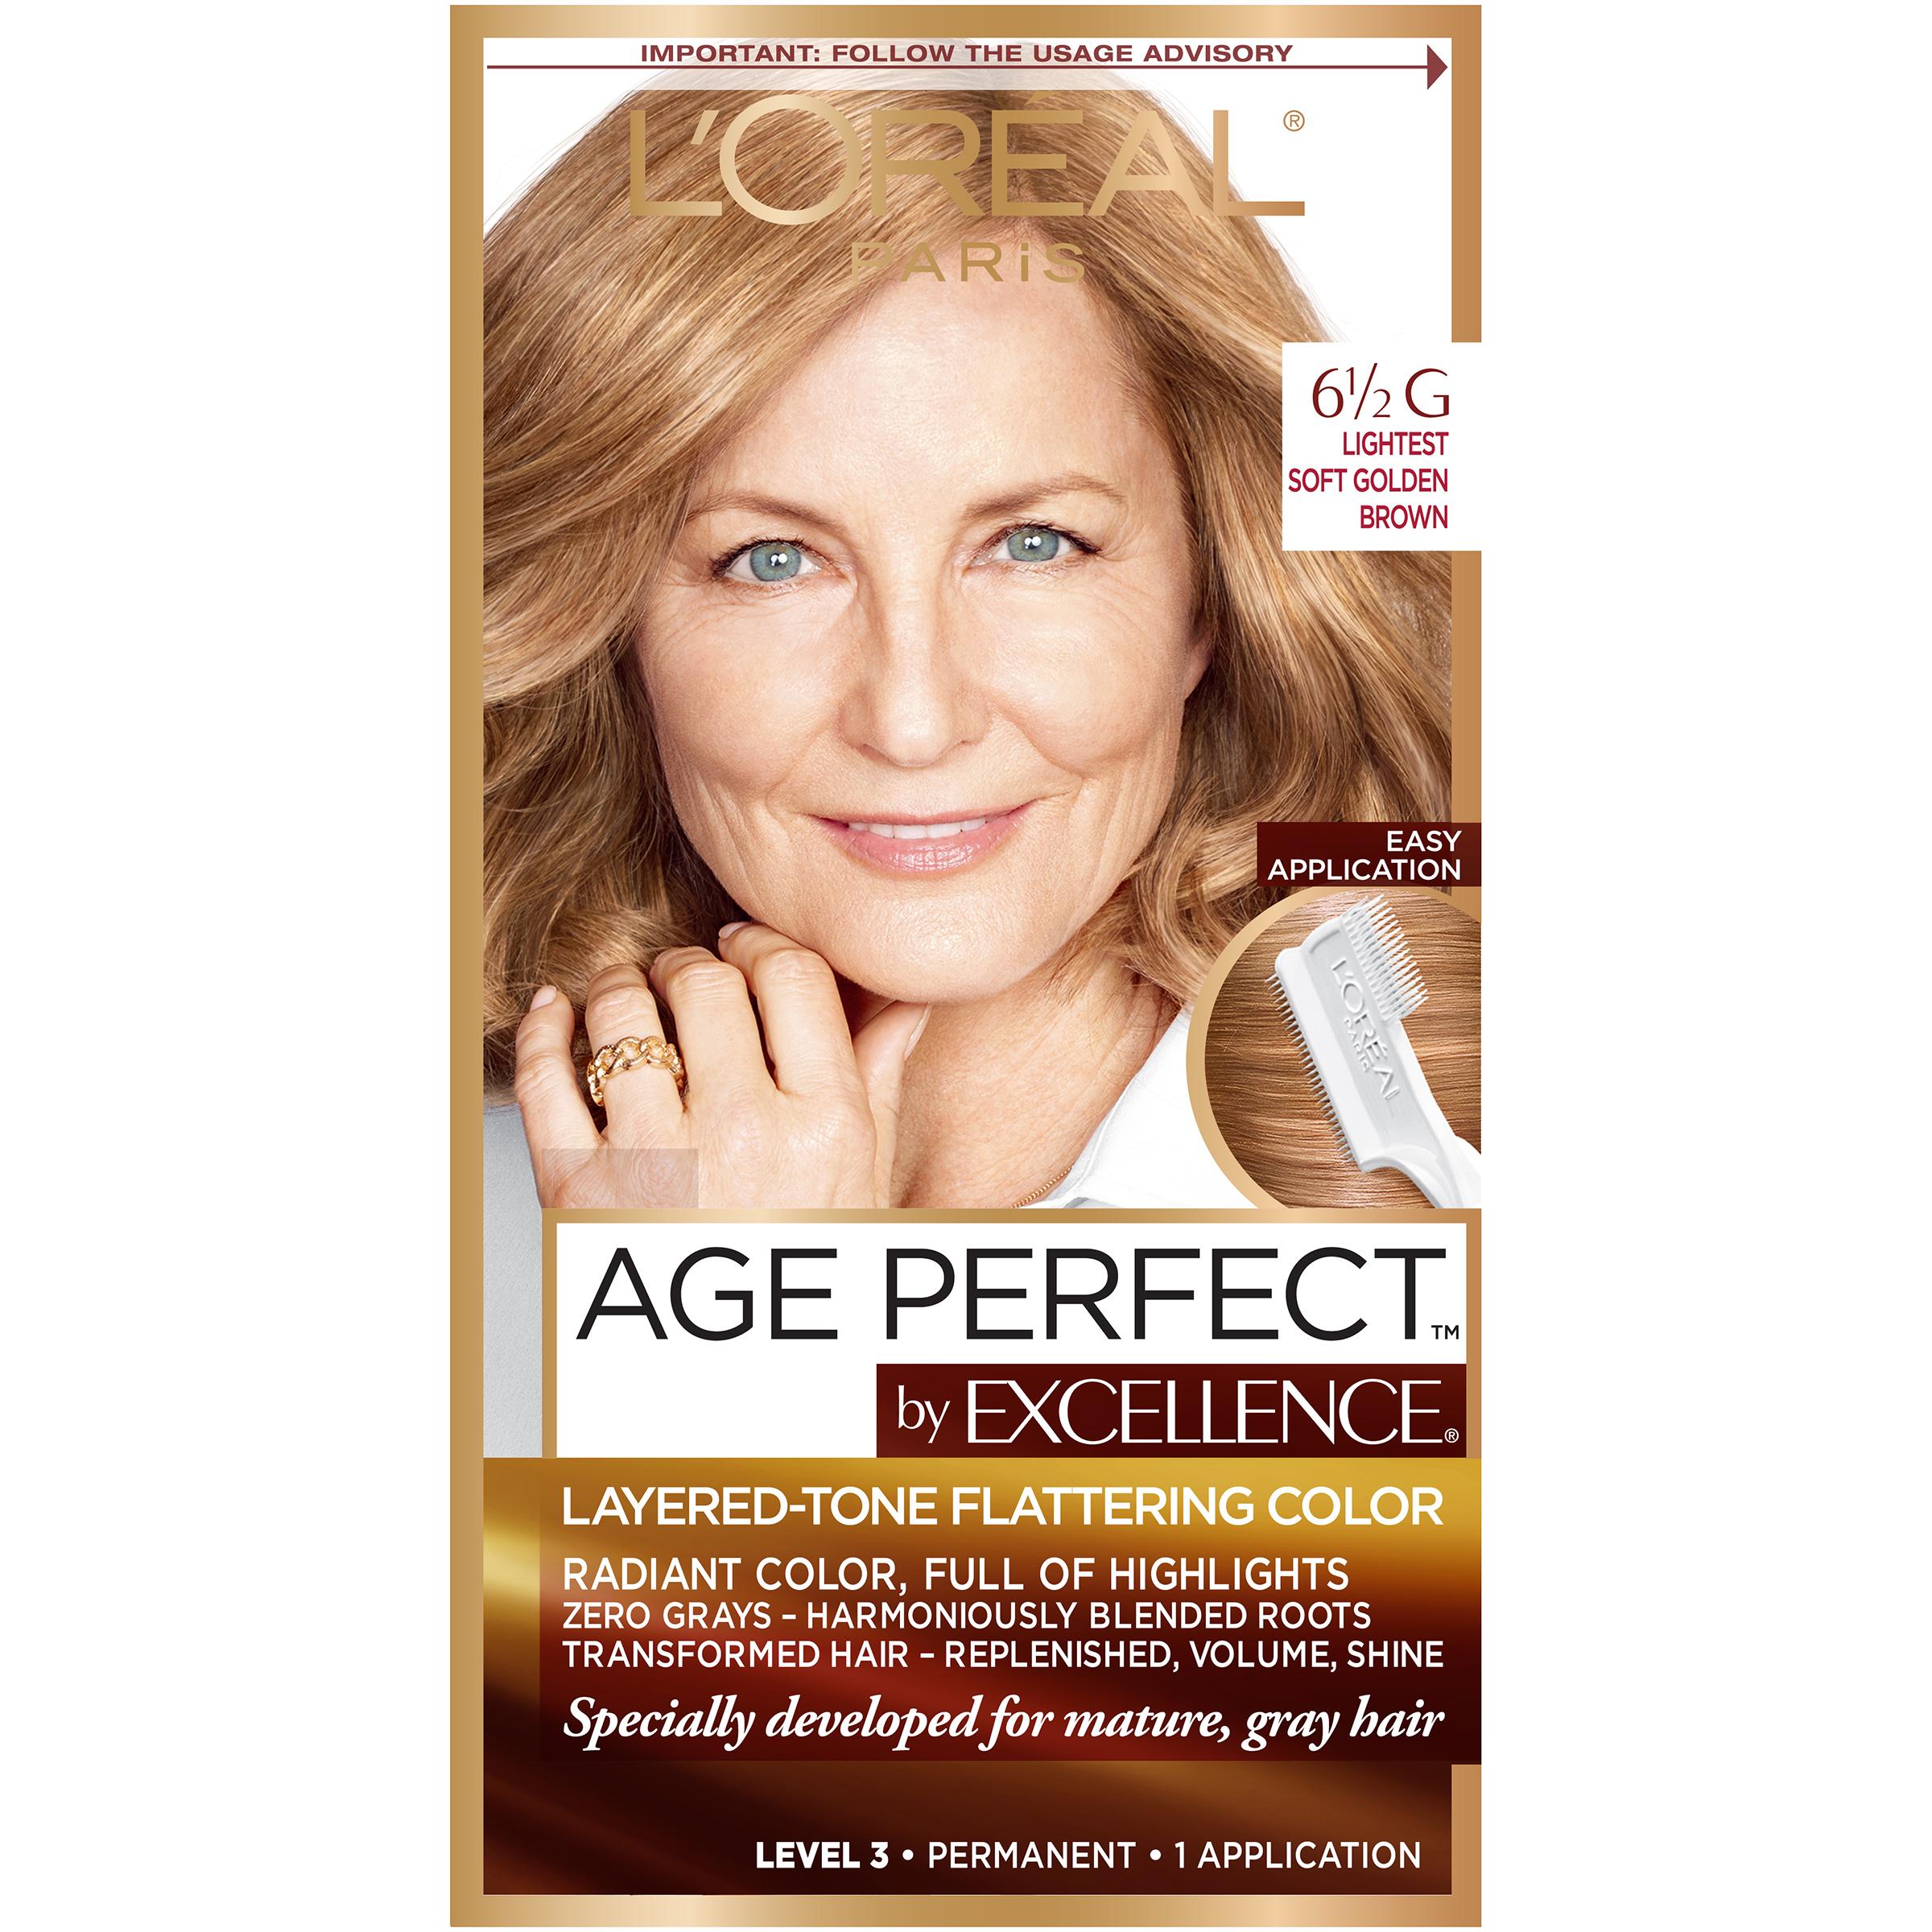 Loreal Paris Age Perfect Permanent Hair Color Ebay